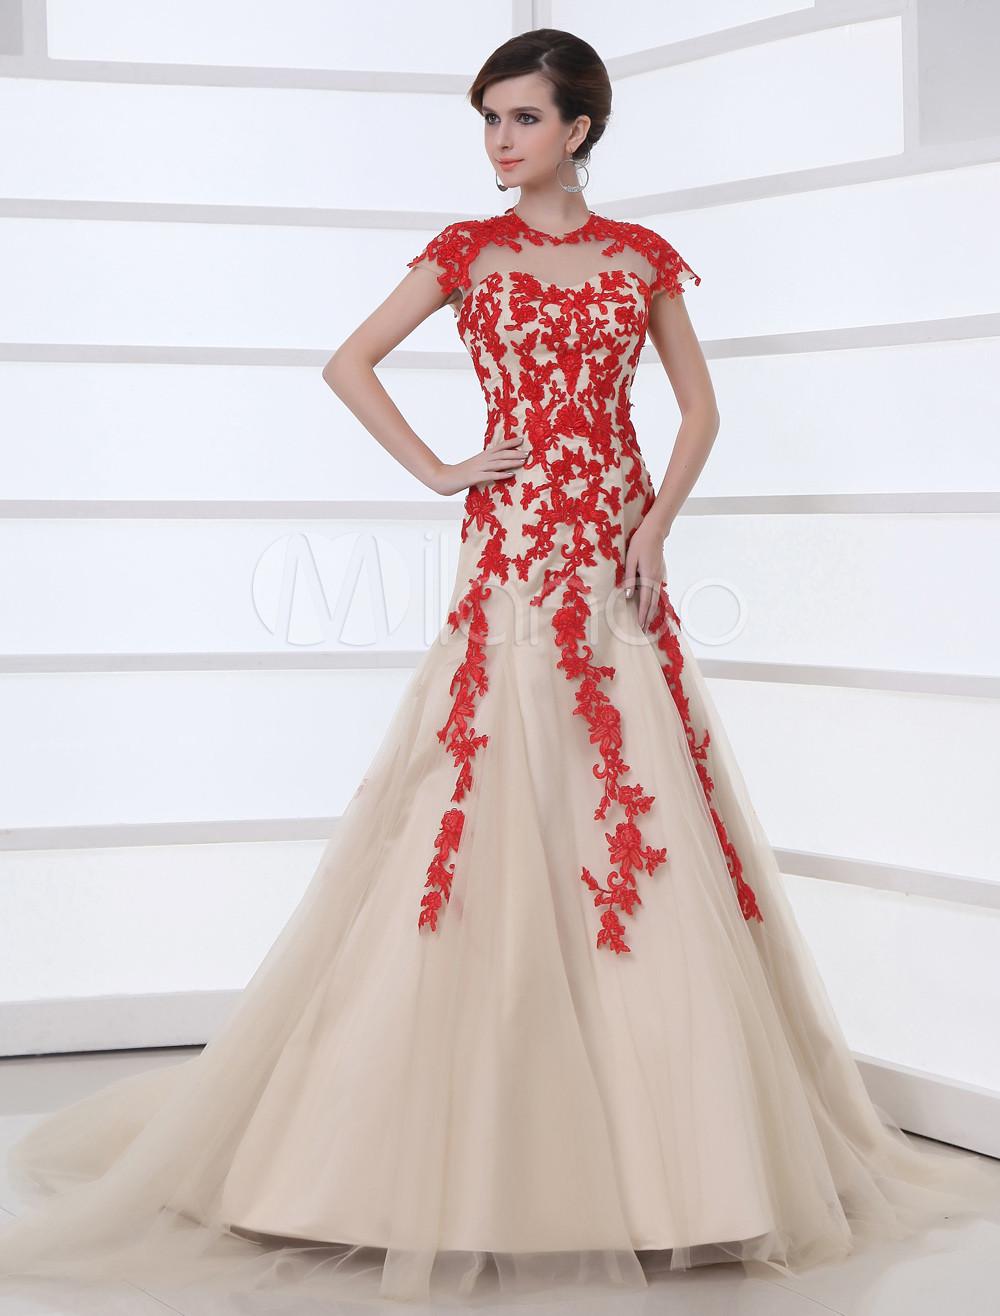 A-line Champagne Net Applique Peter Pan Collar Prom Dress